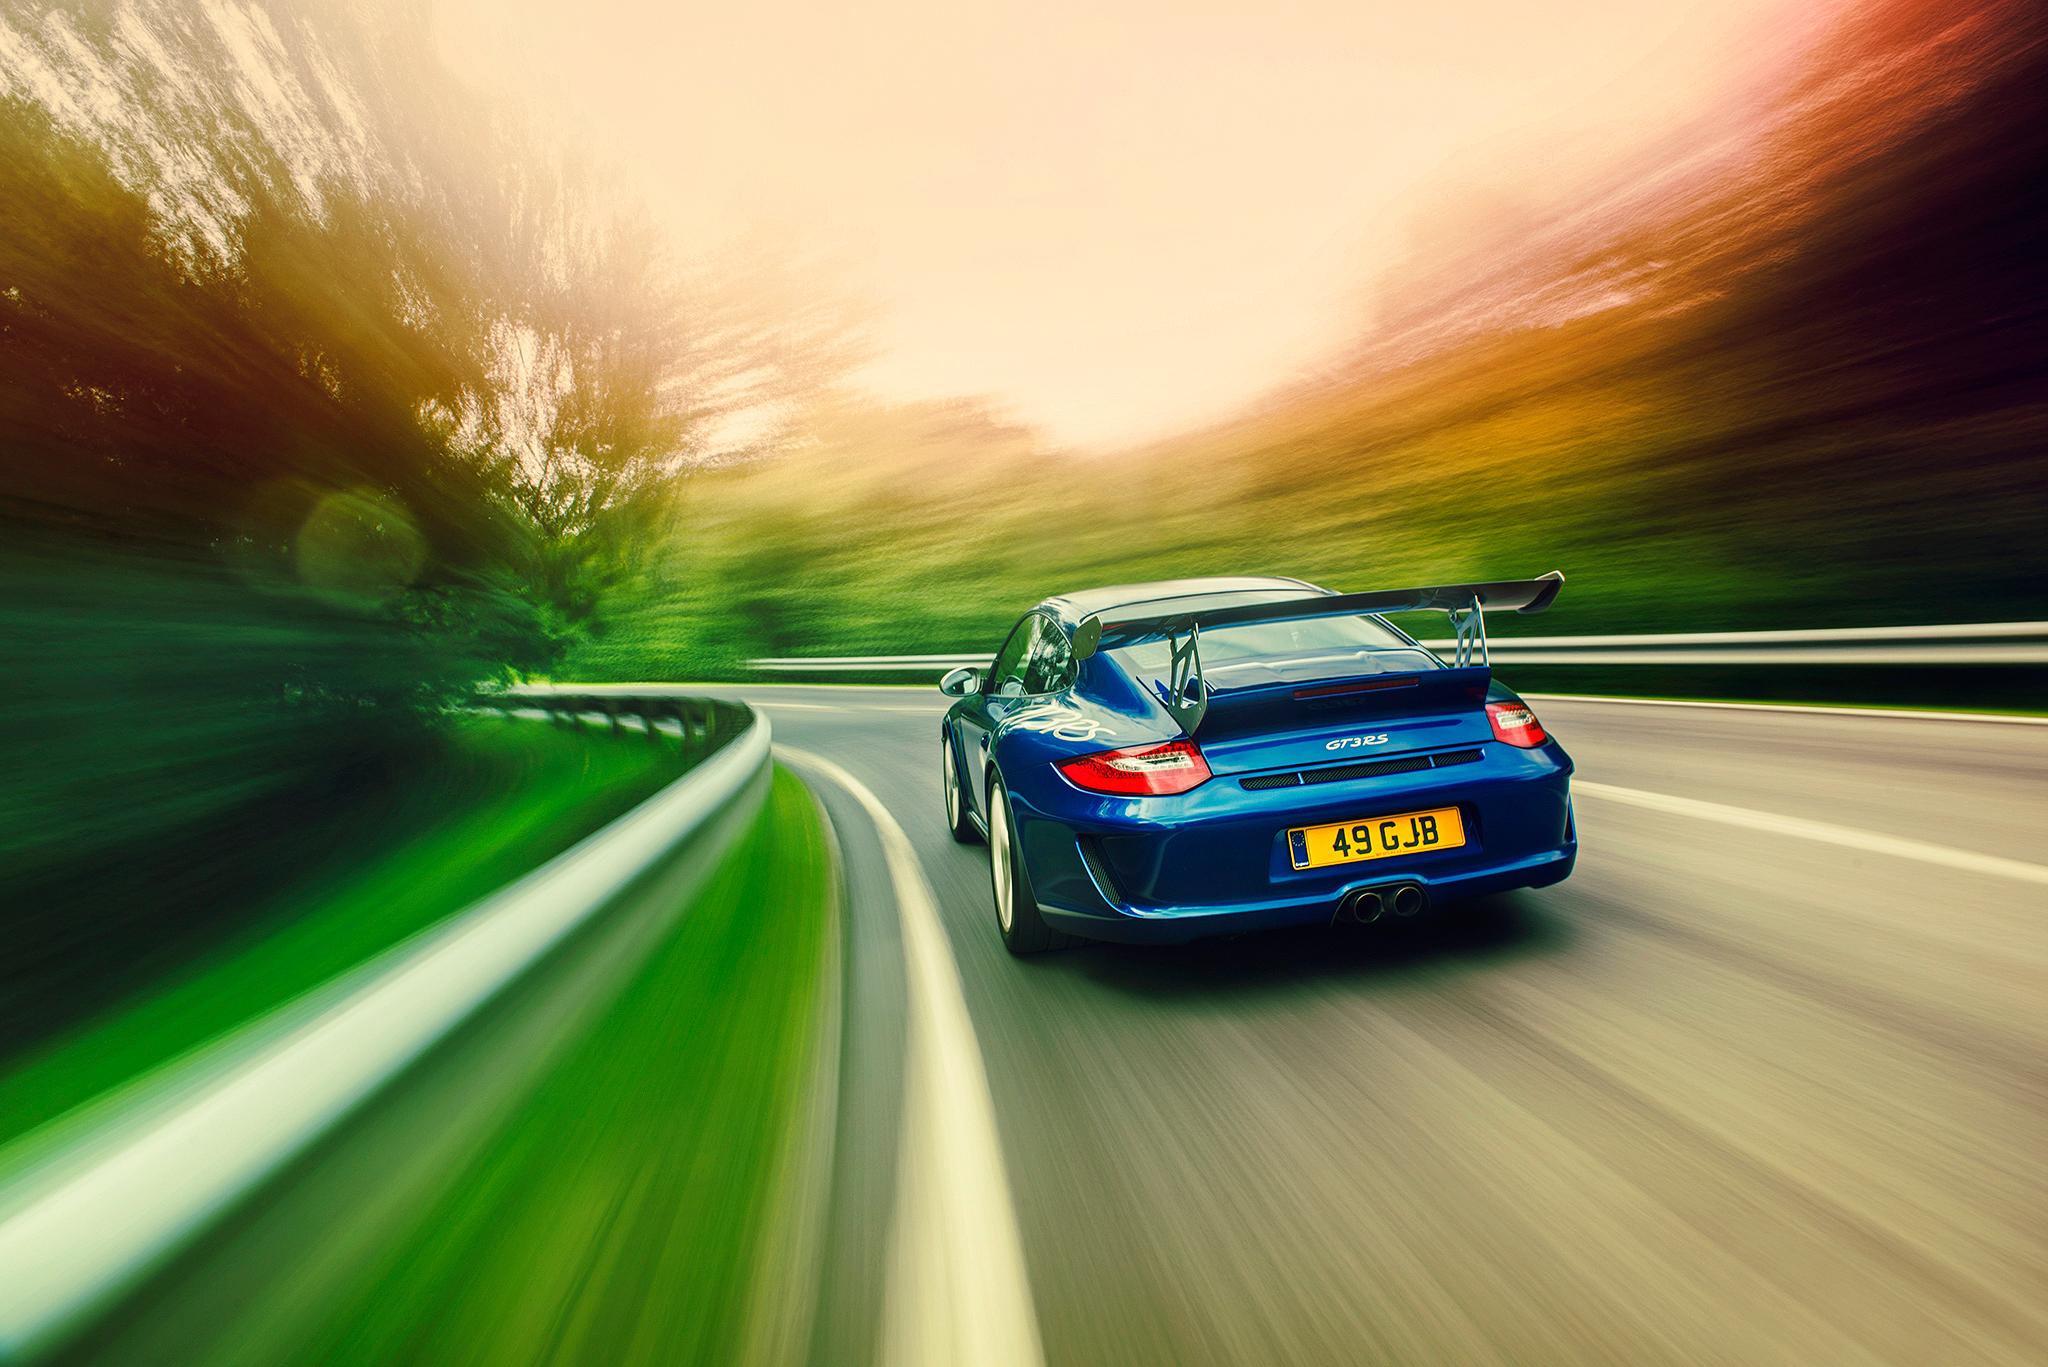 Картинки о скорости